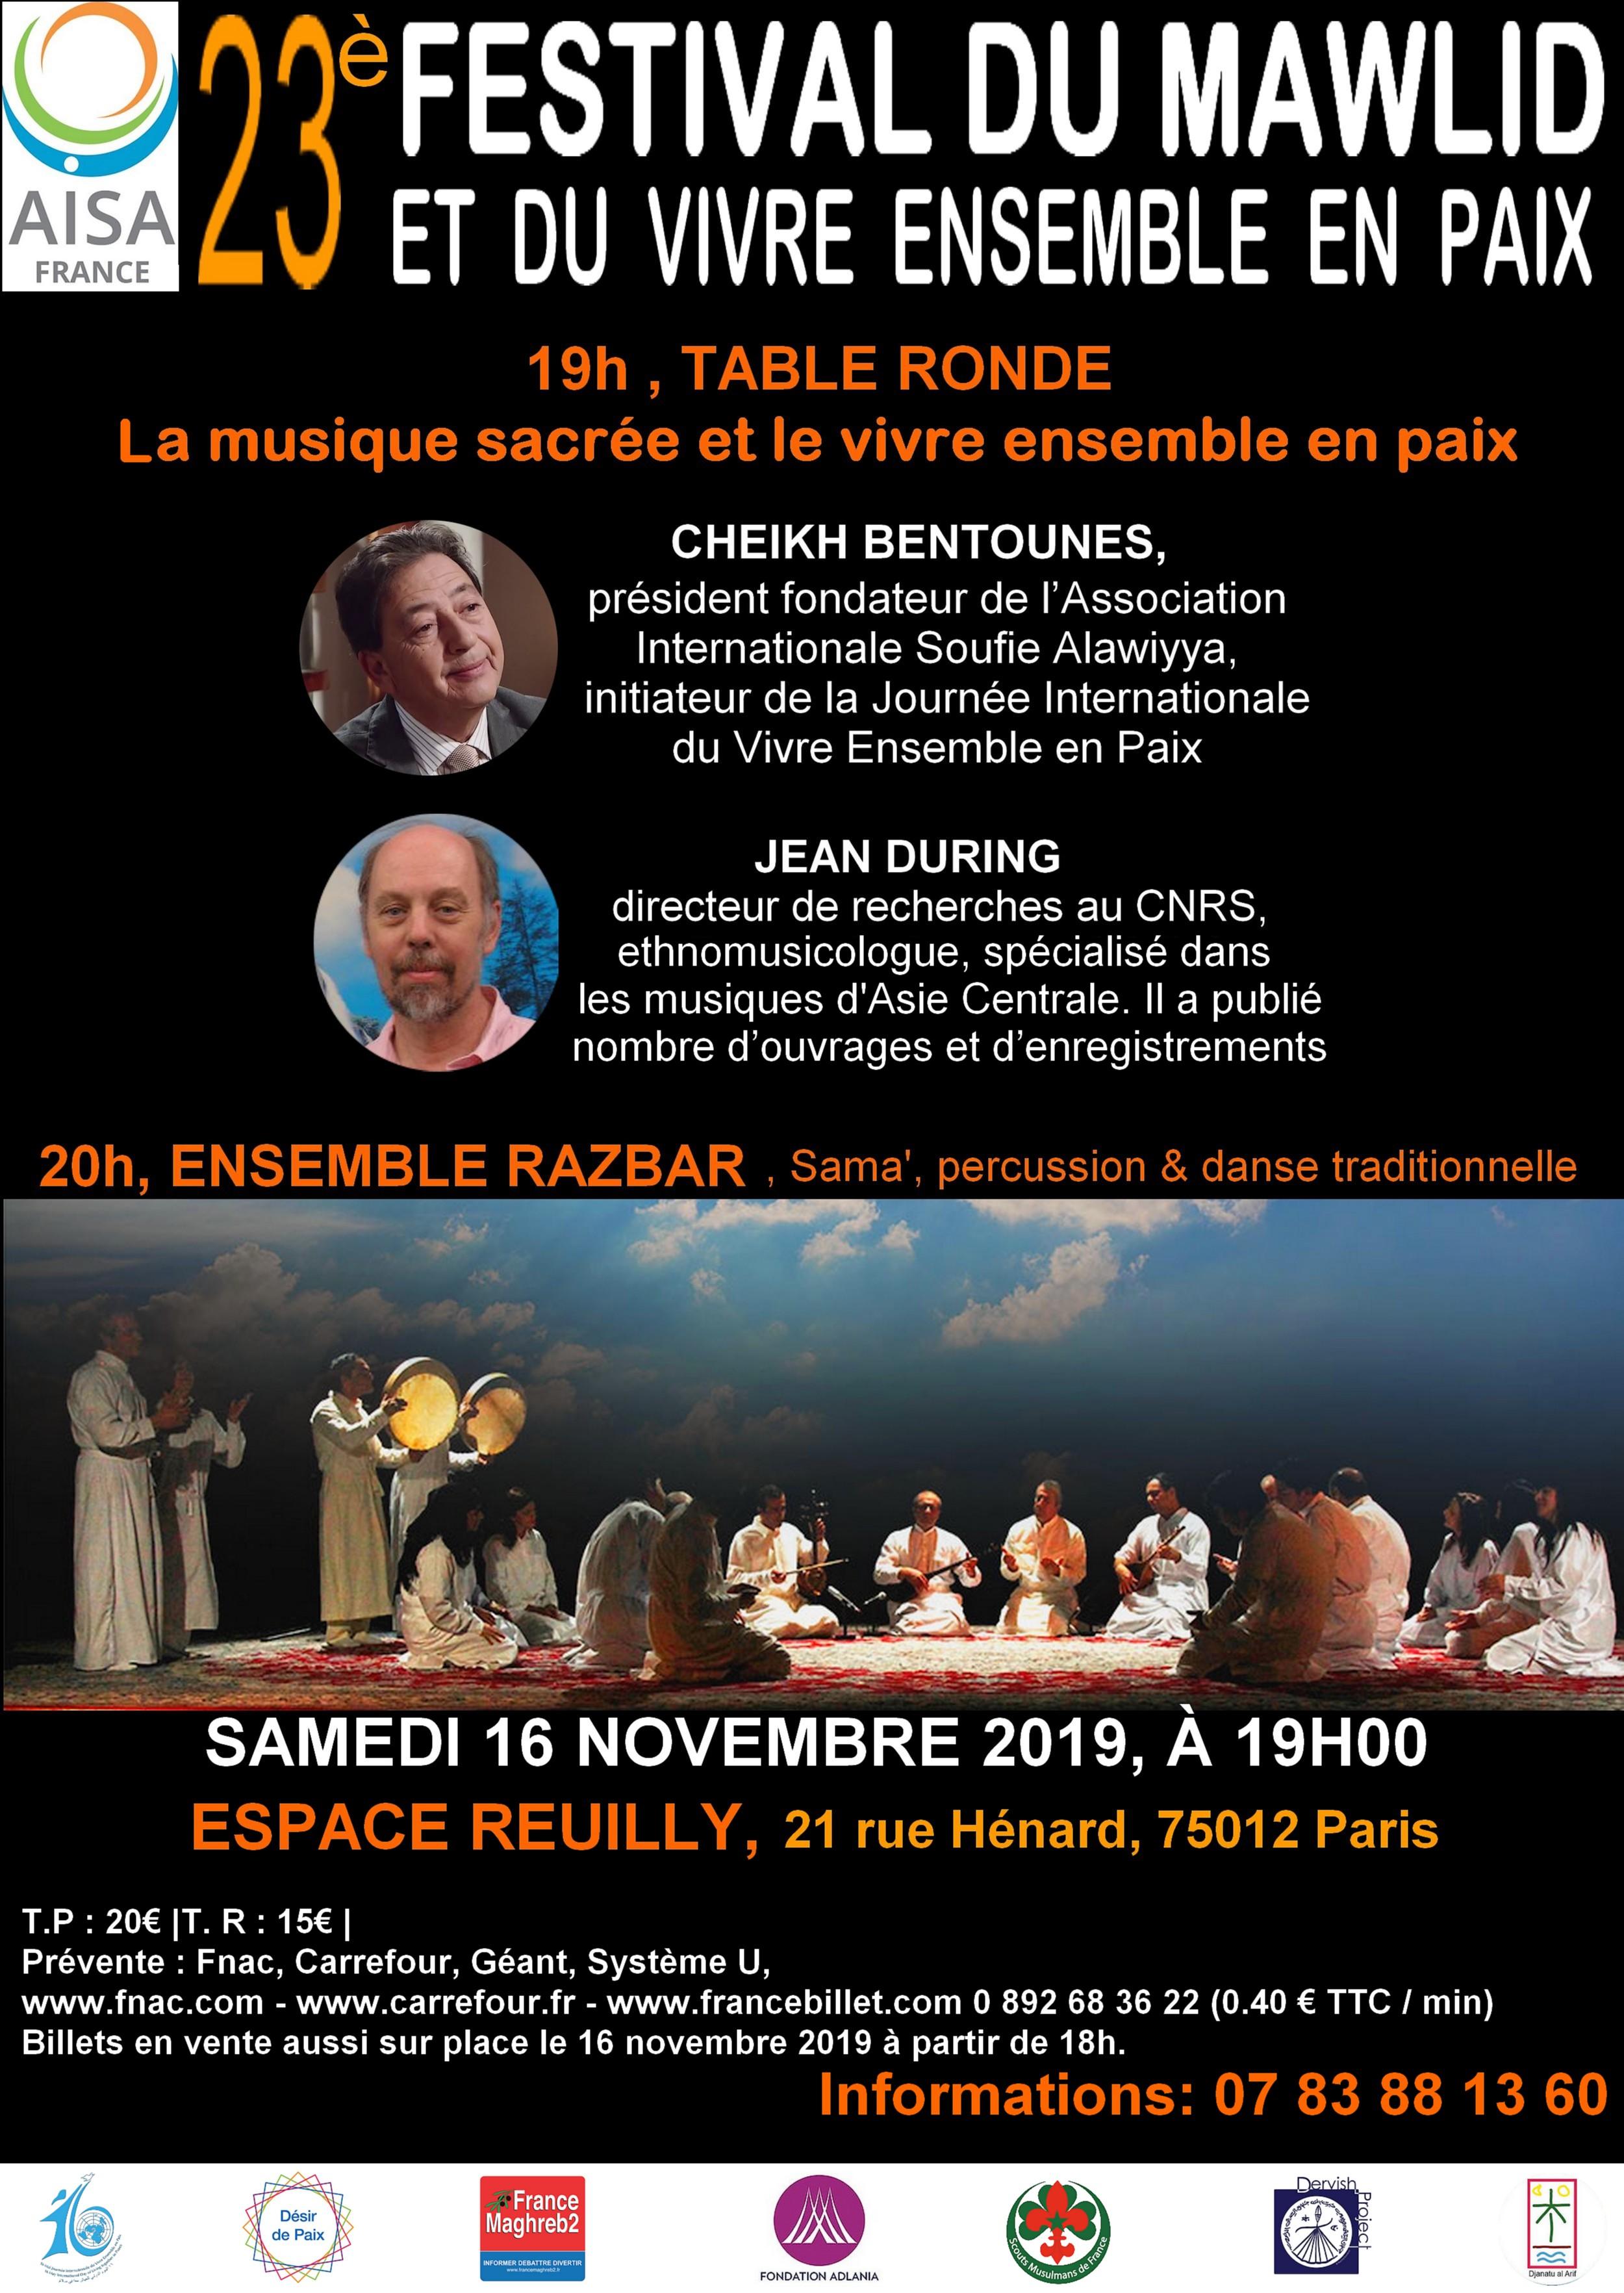 https://www.saphirnews.com/agenda/23e-Festival-du-Mawlid-et-du-vivre-ensemble-en-paix_ae681042.html